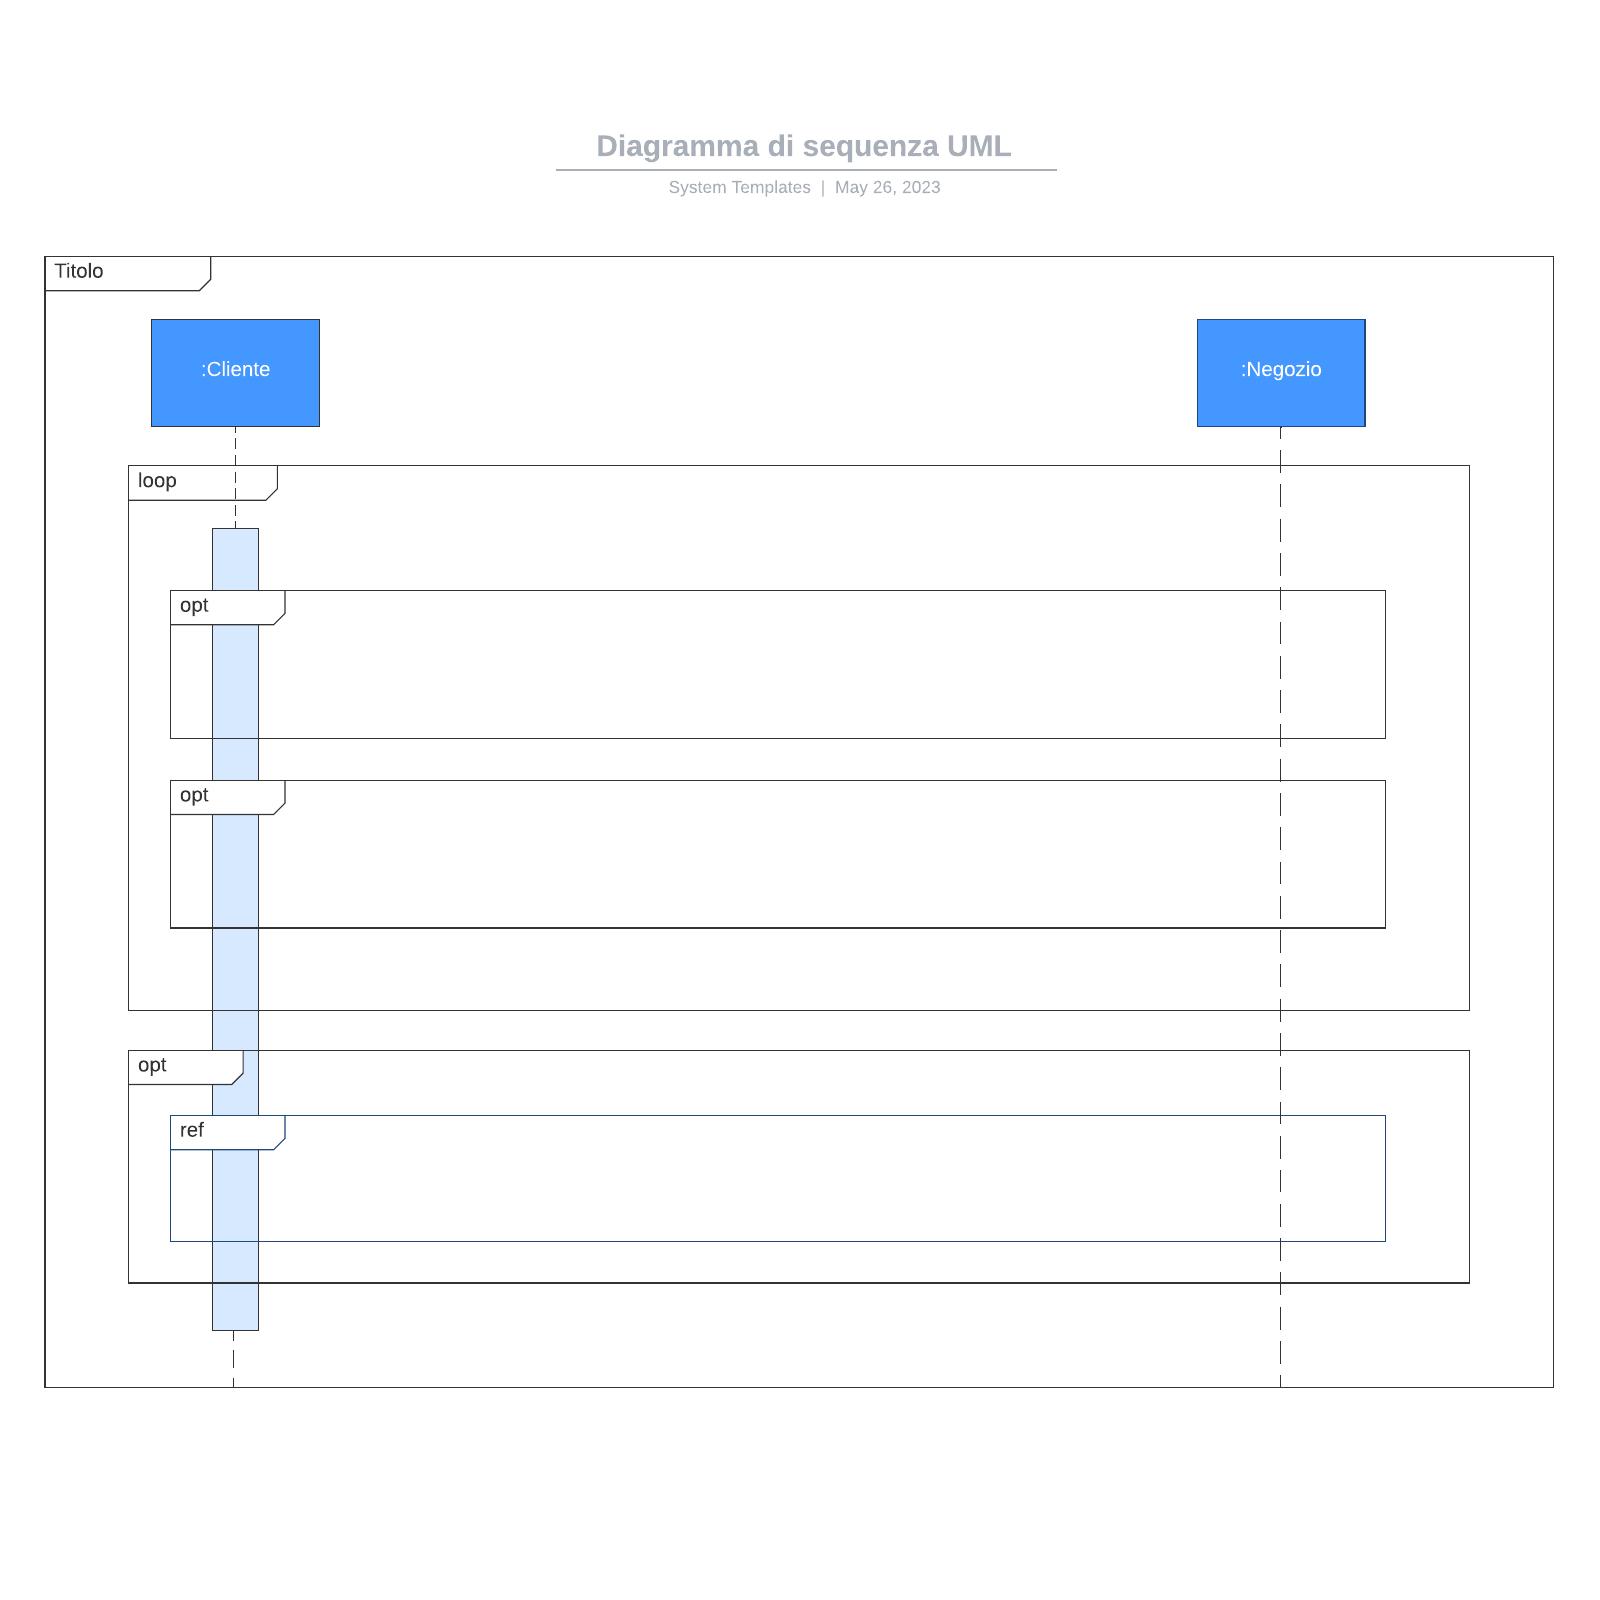 Diagramma di sequenza UML